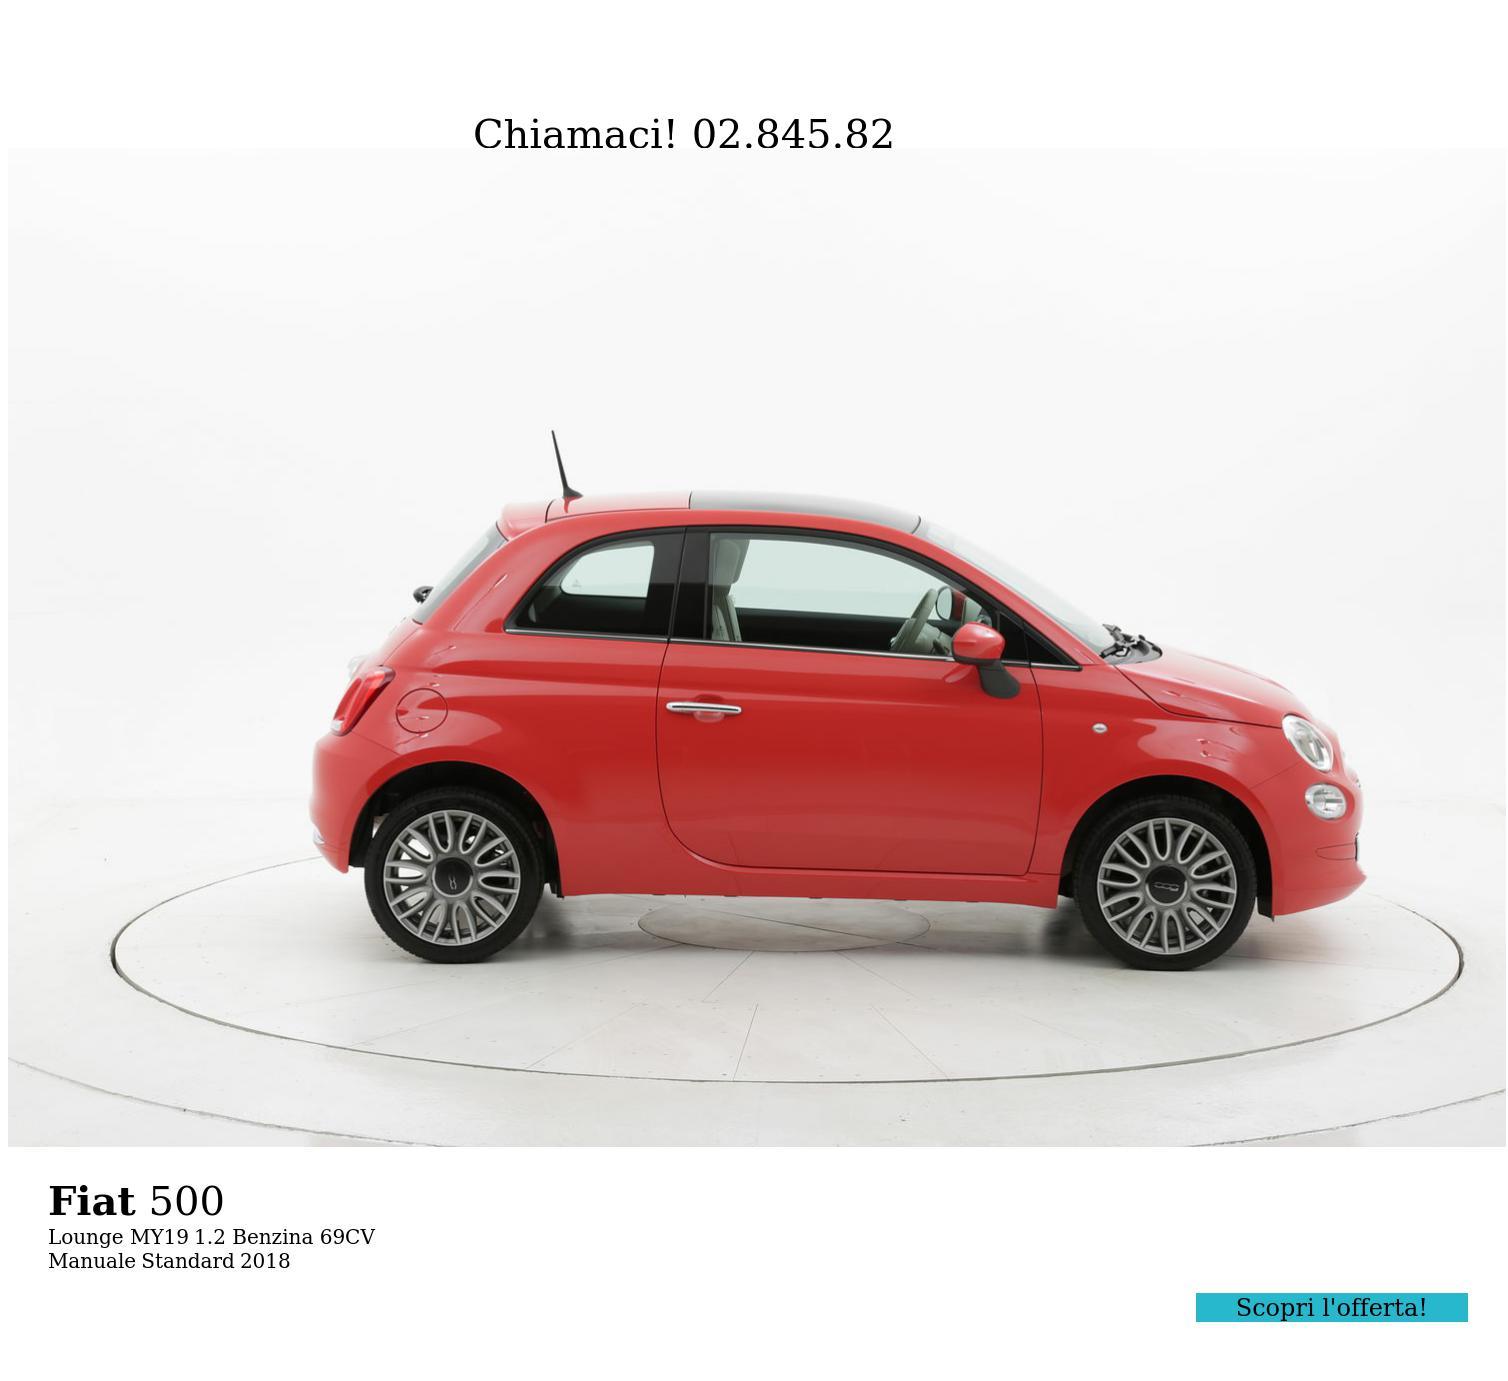 Fiat 500 Lounge MY19 km 0 benzina rossa   brumbrum